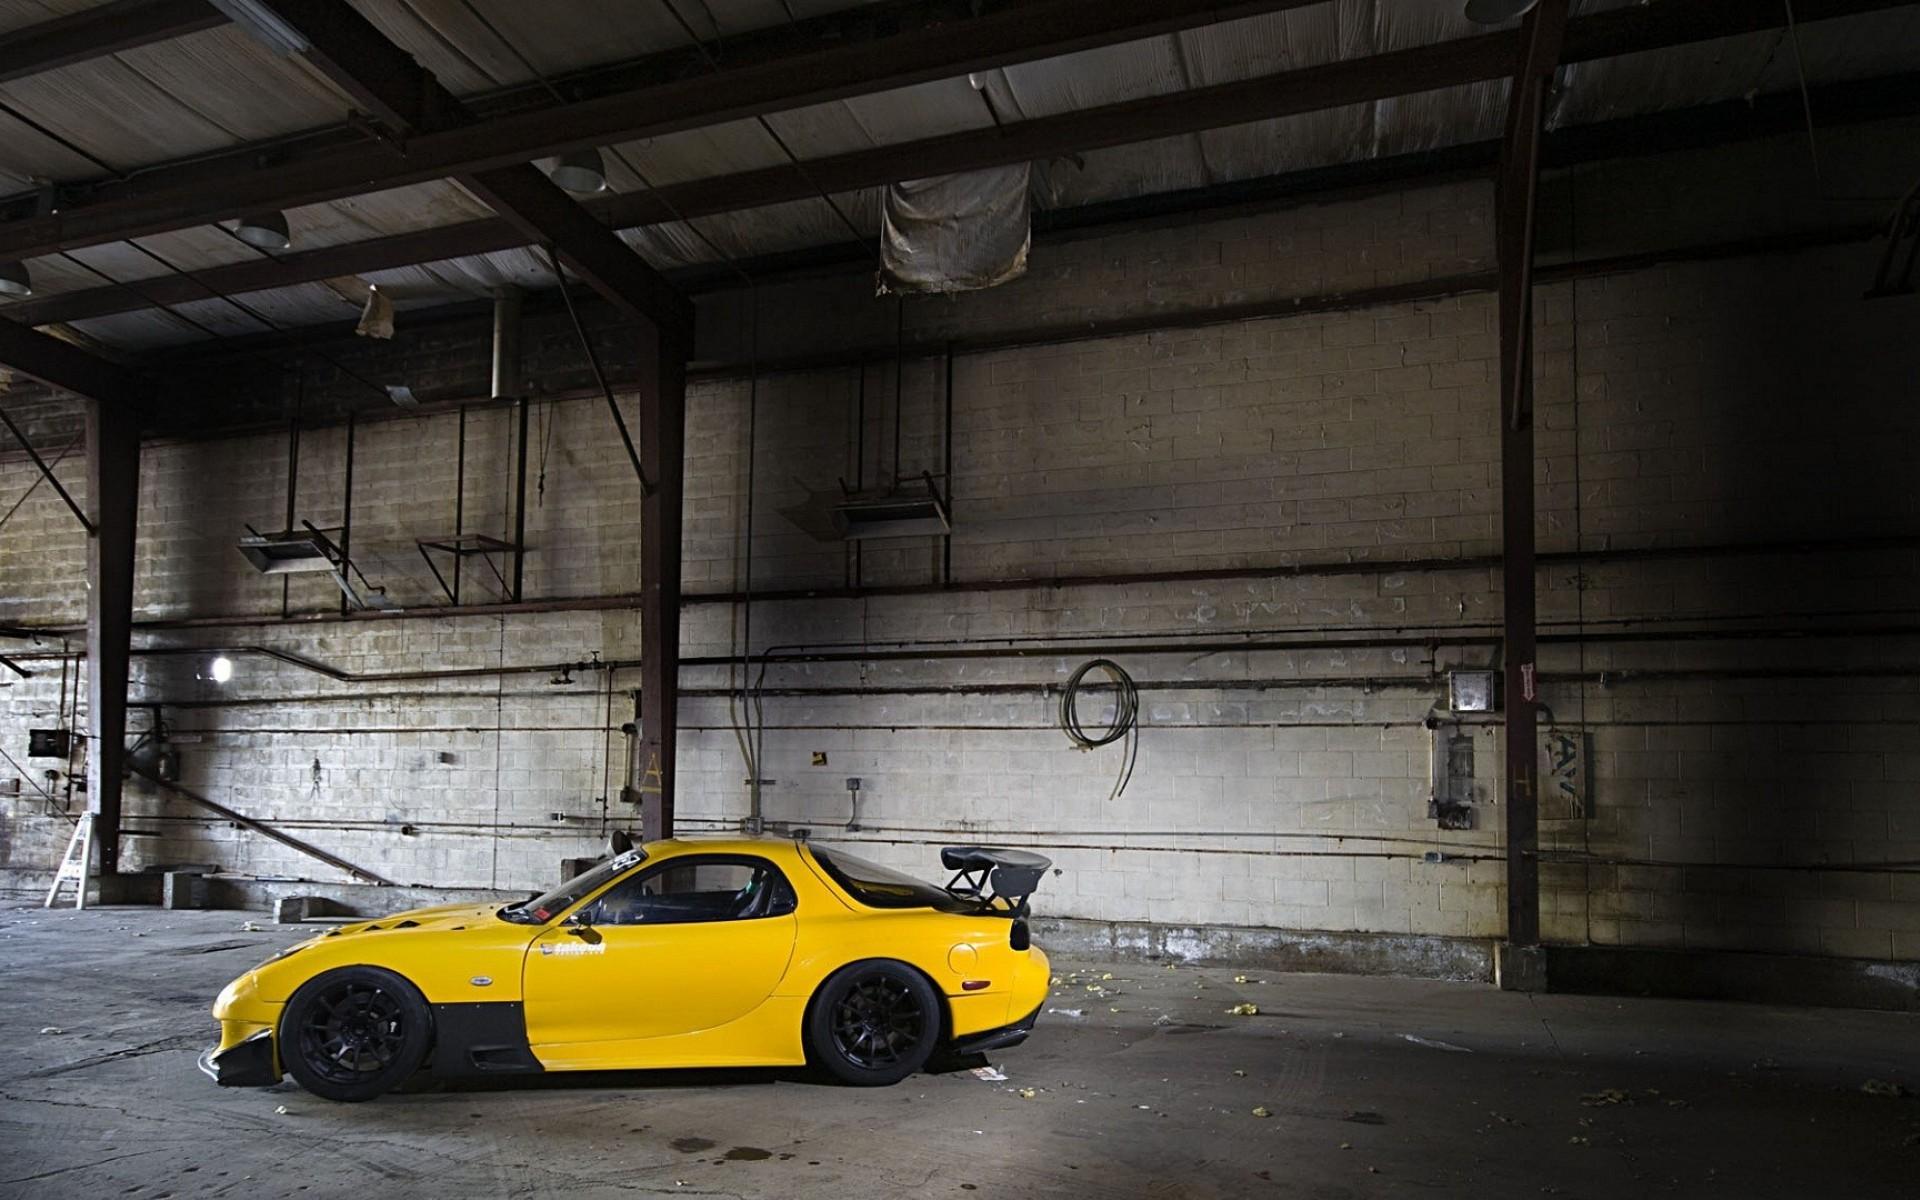 Wallpaper 1920x1200 Px Car Jdm Mazda Rx 7 Stance Yellow Cars 1920x1200 Wallpaperup 1096440 Hd Wallpapers Wallhere